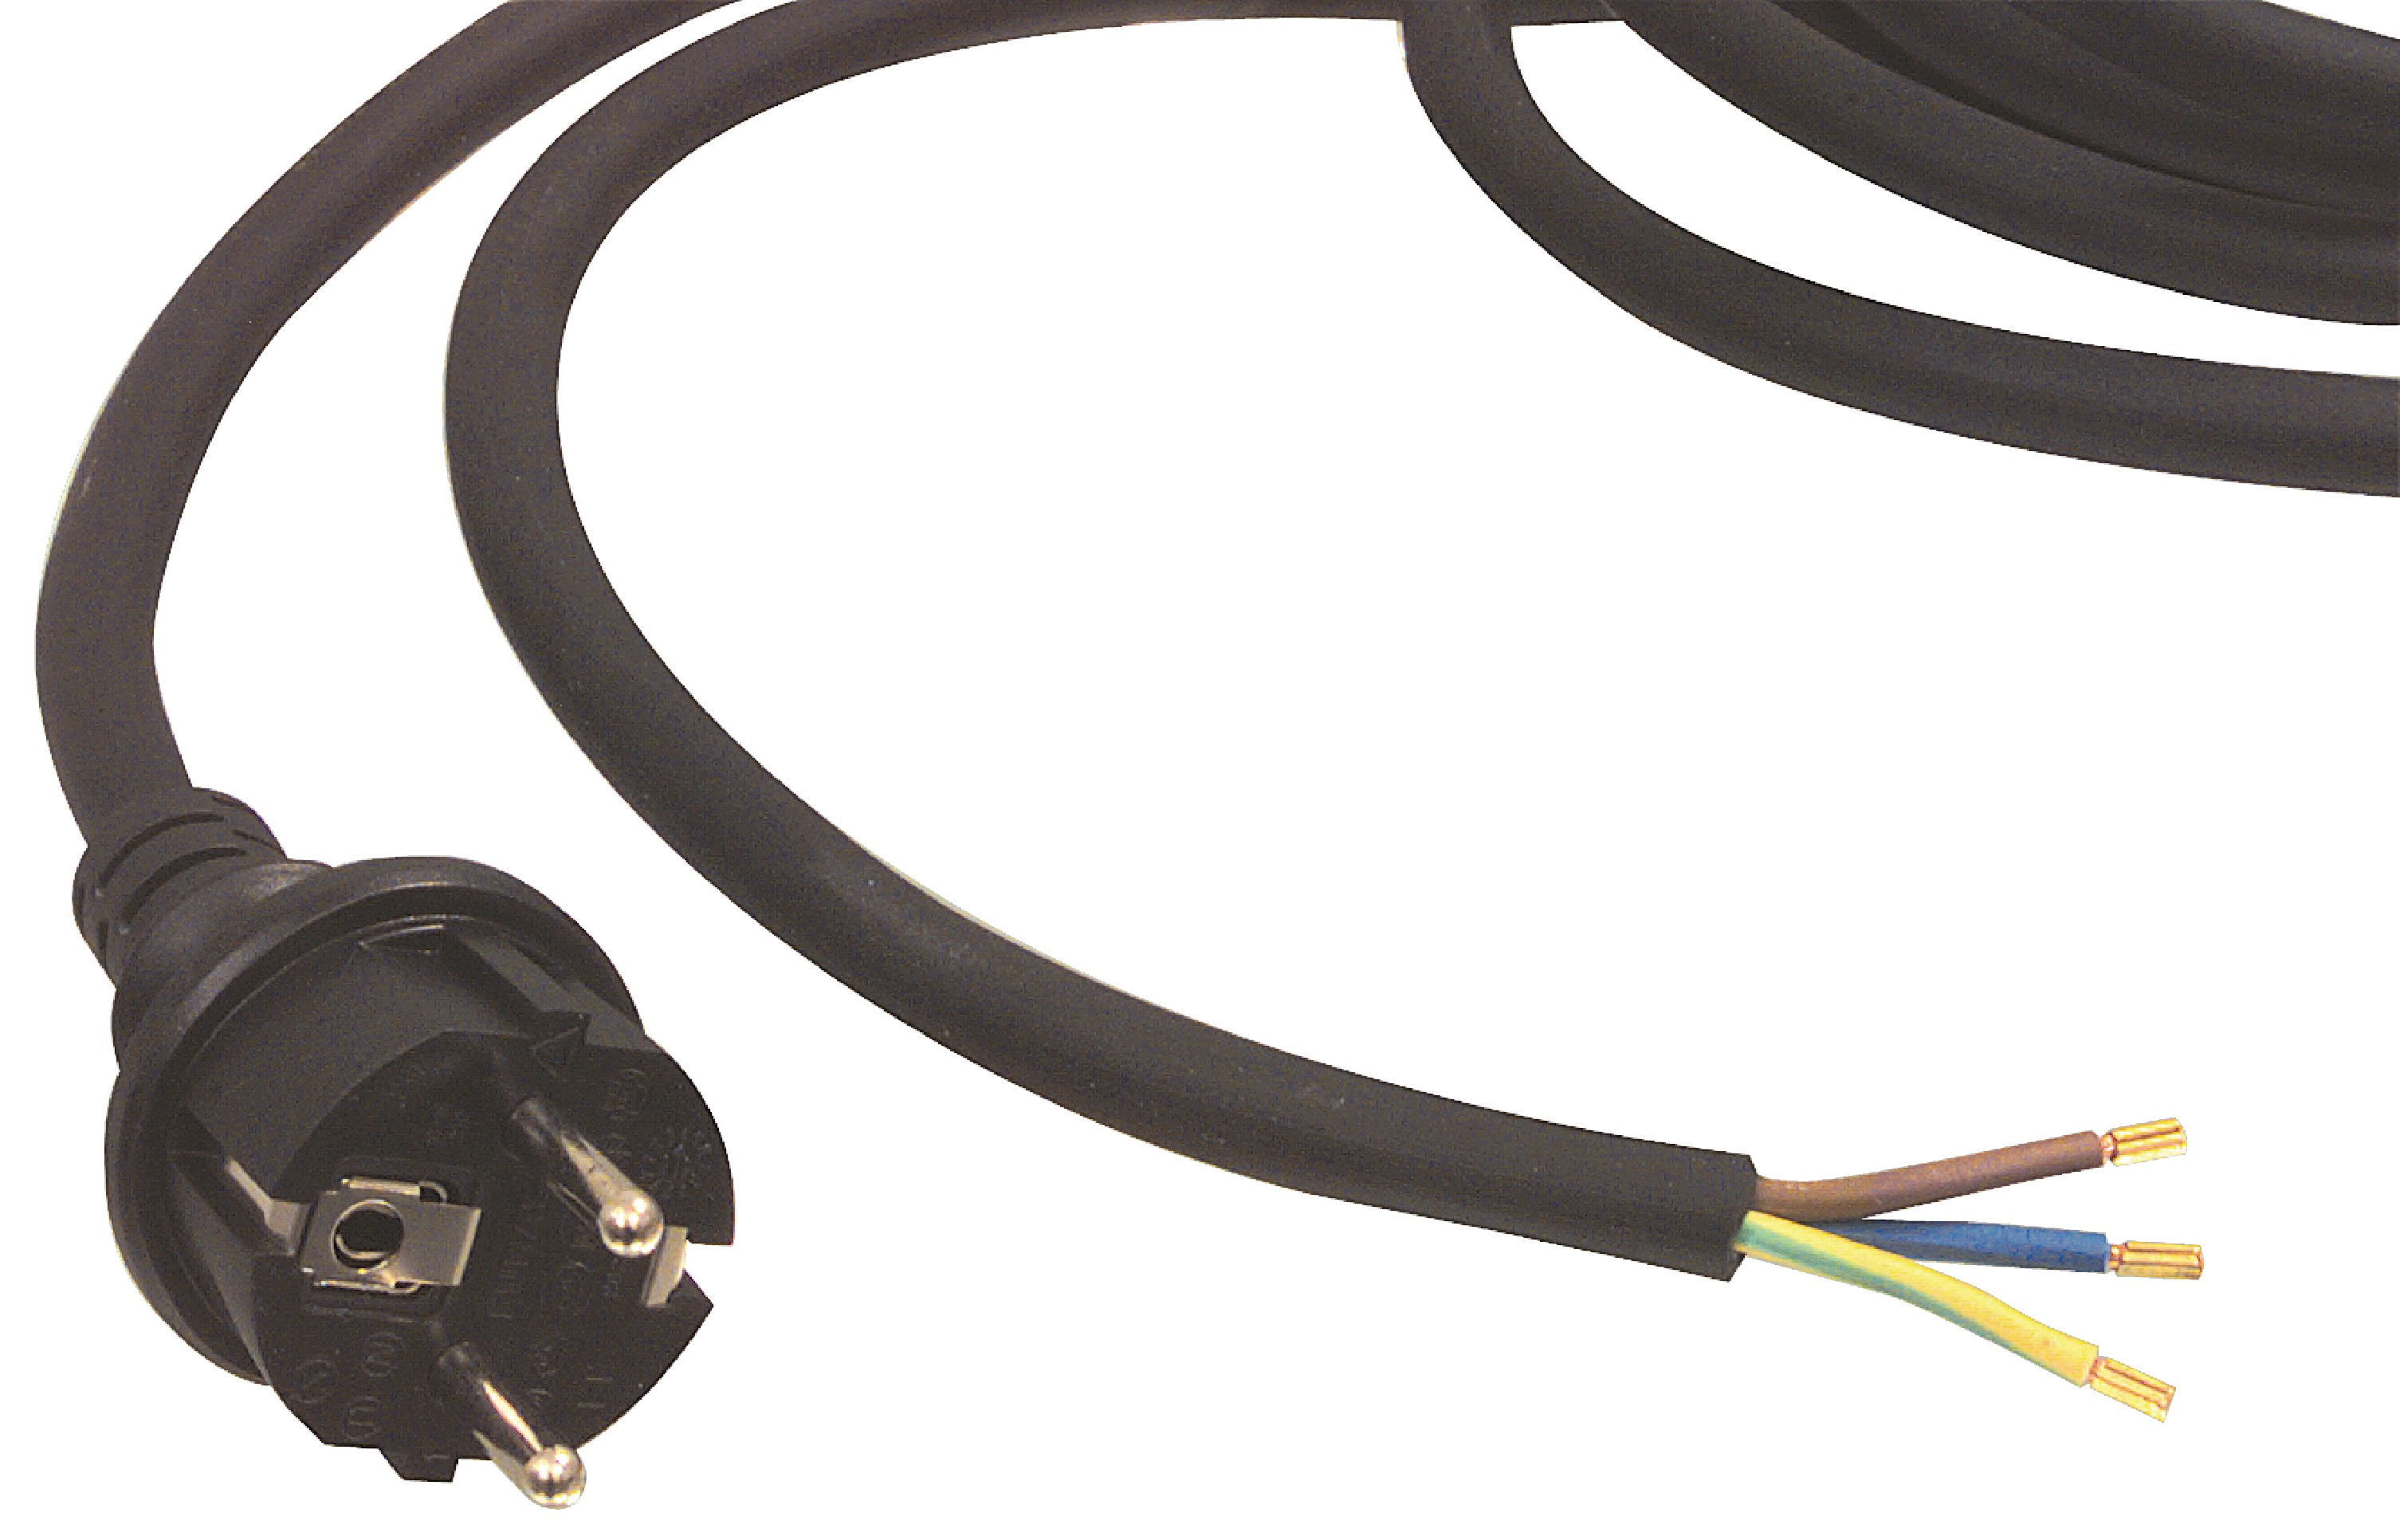 Napájecí flexo kabel neoprenový 3 x 1.5 mm 3.00 m W8-90003